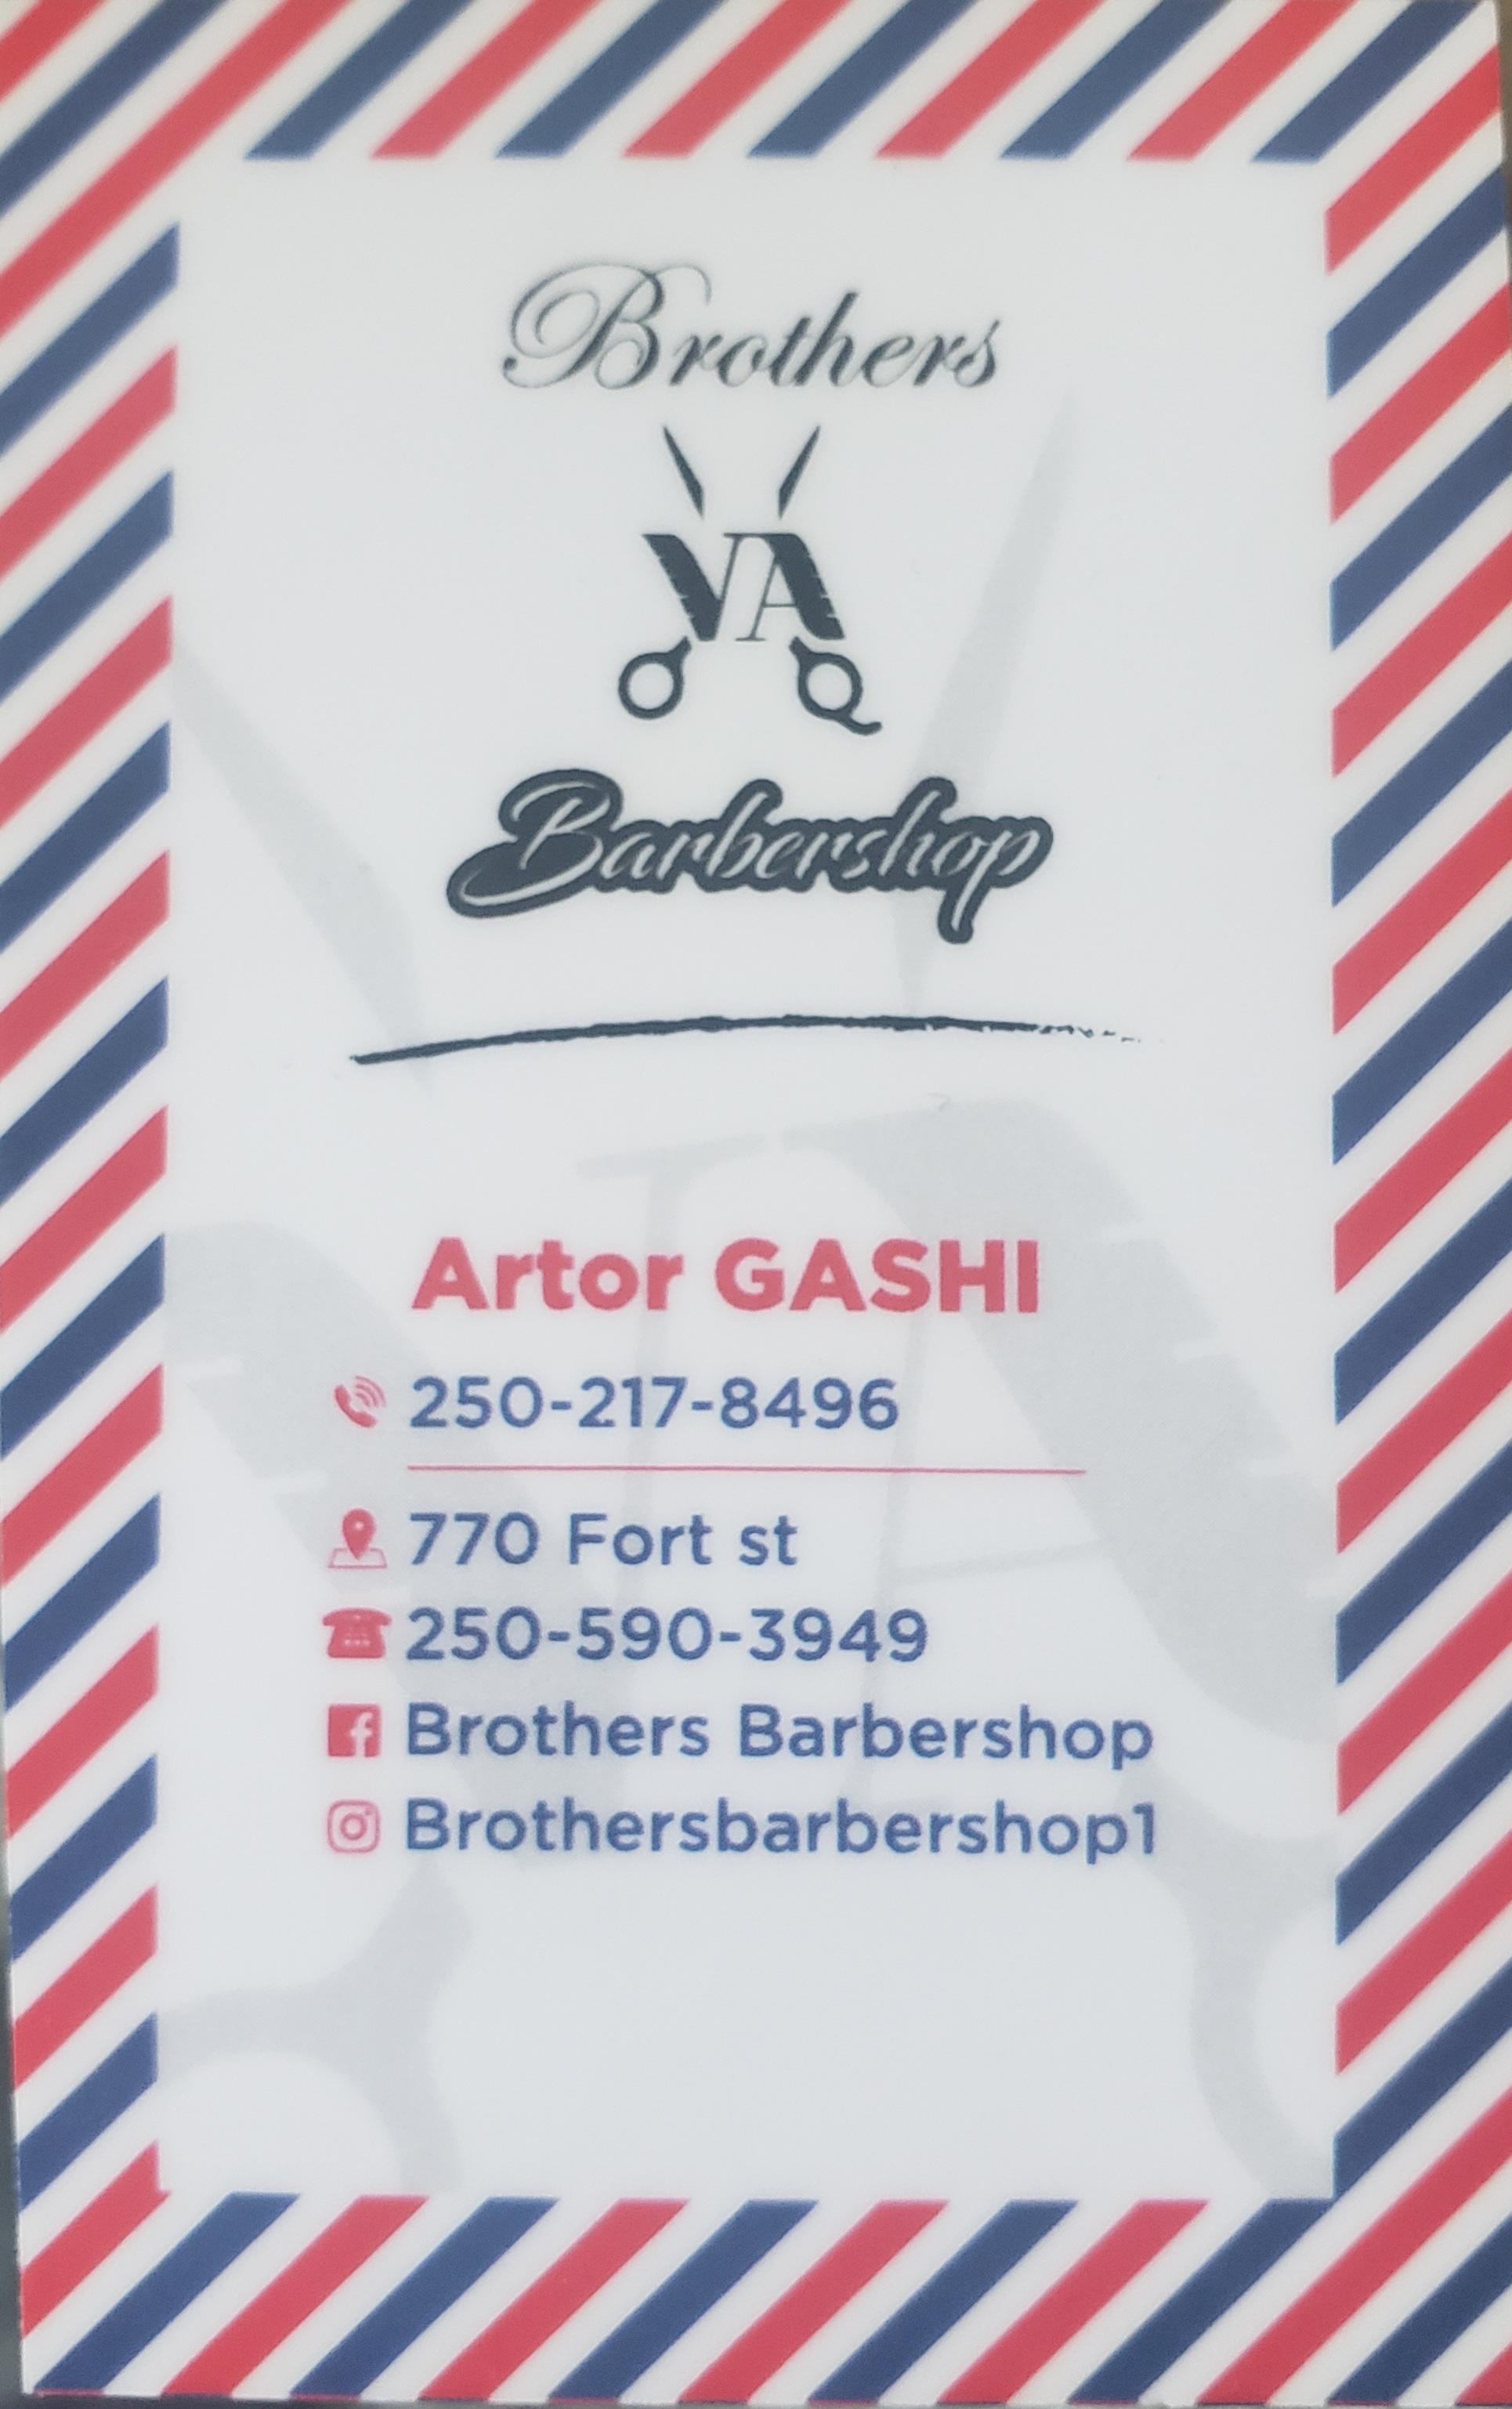 Brother's Barbershop logo